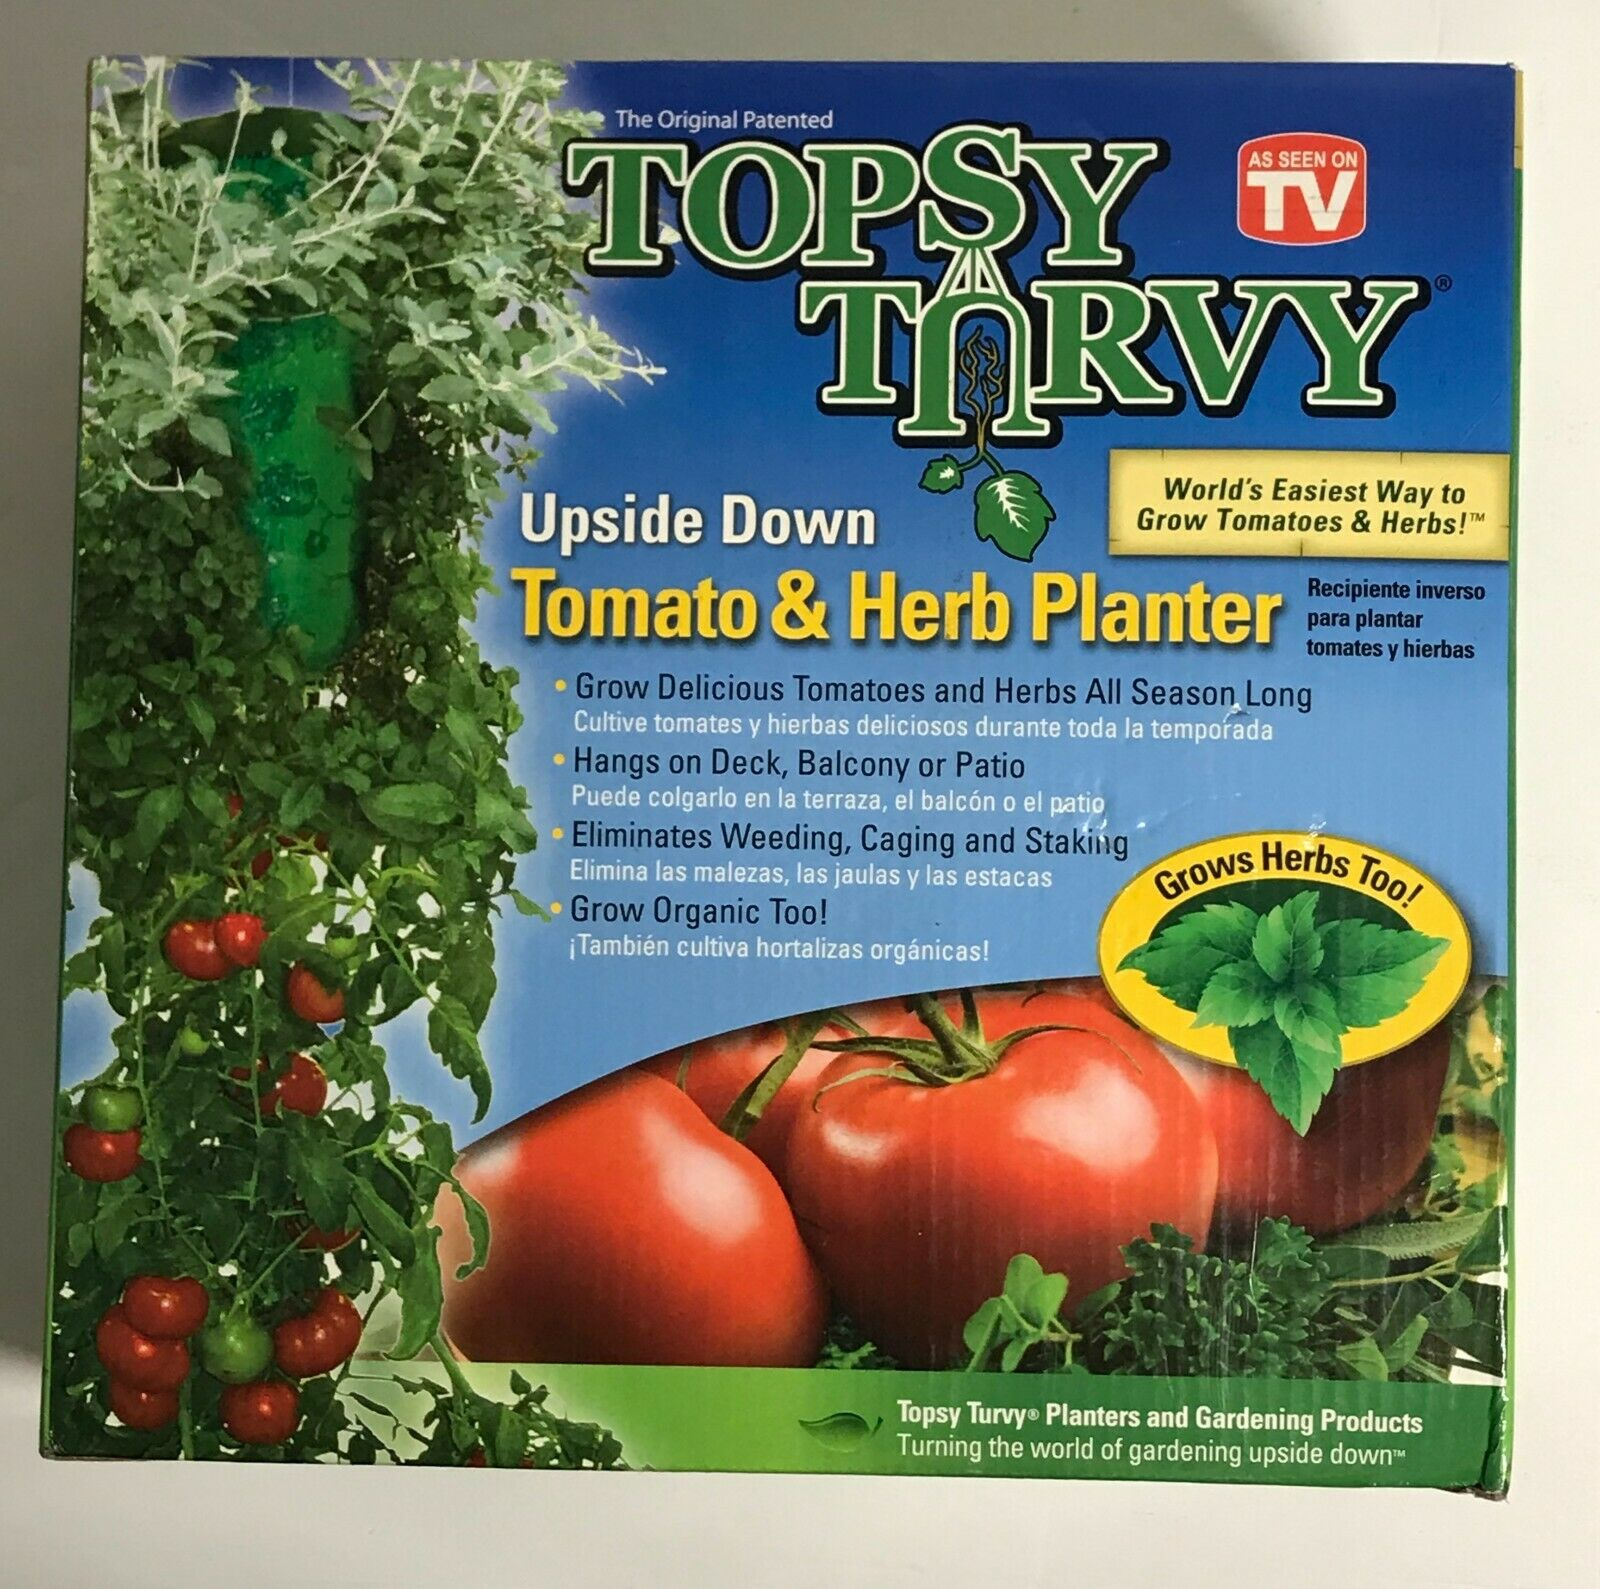 Planter Des Tomates En Pot topsy turvy upside down tomato and herb planter